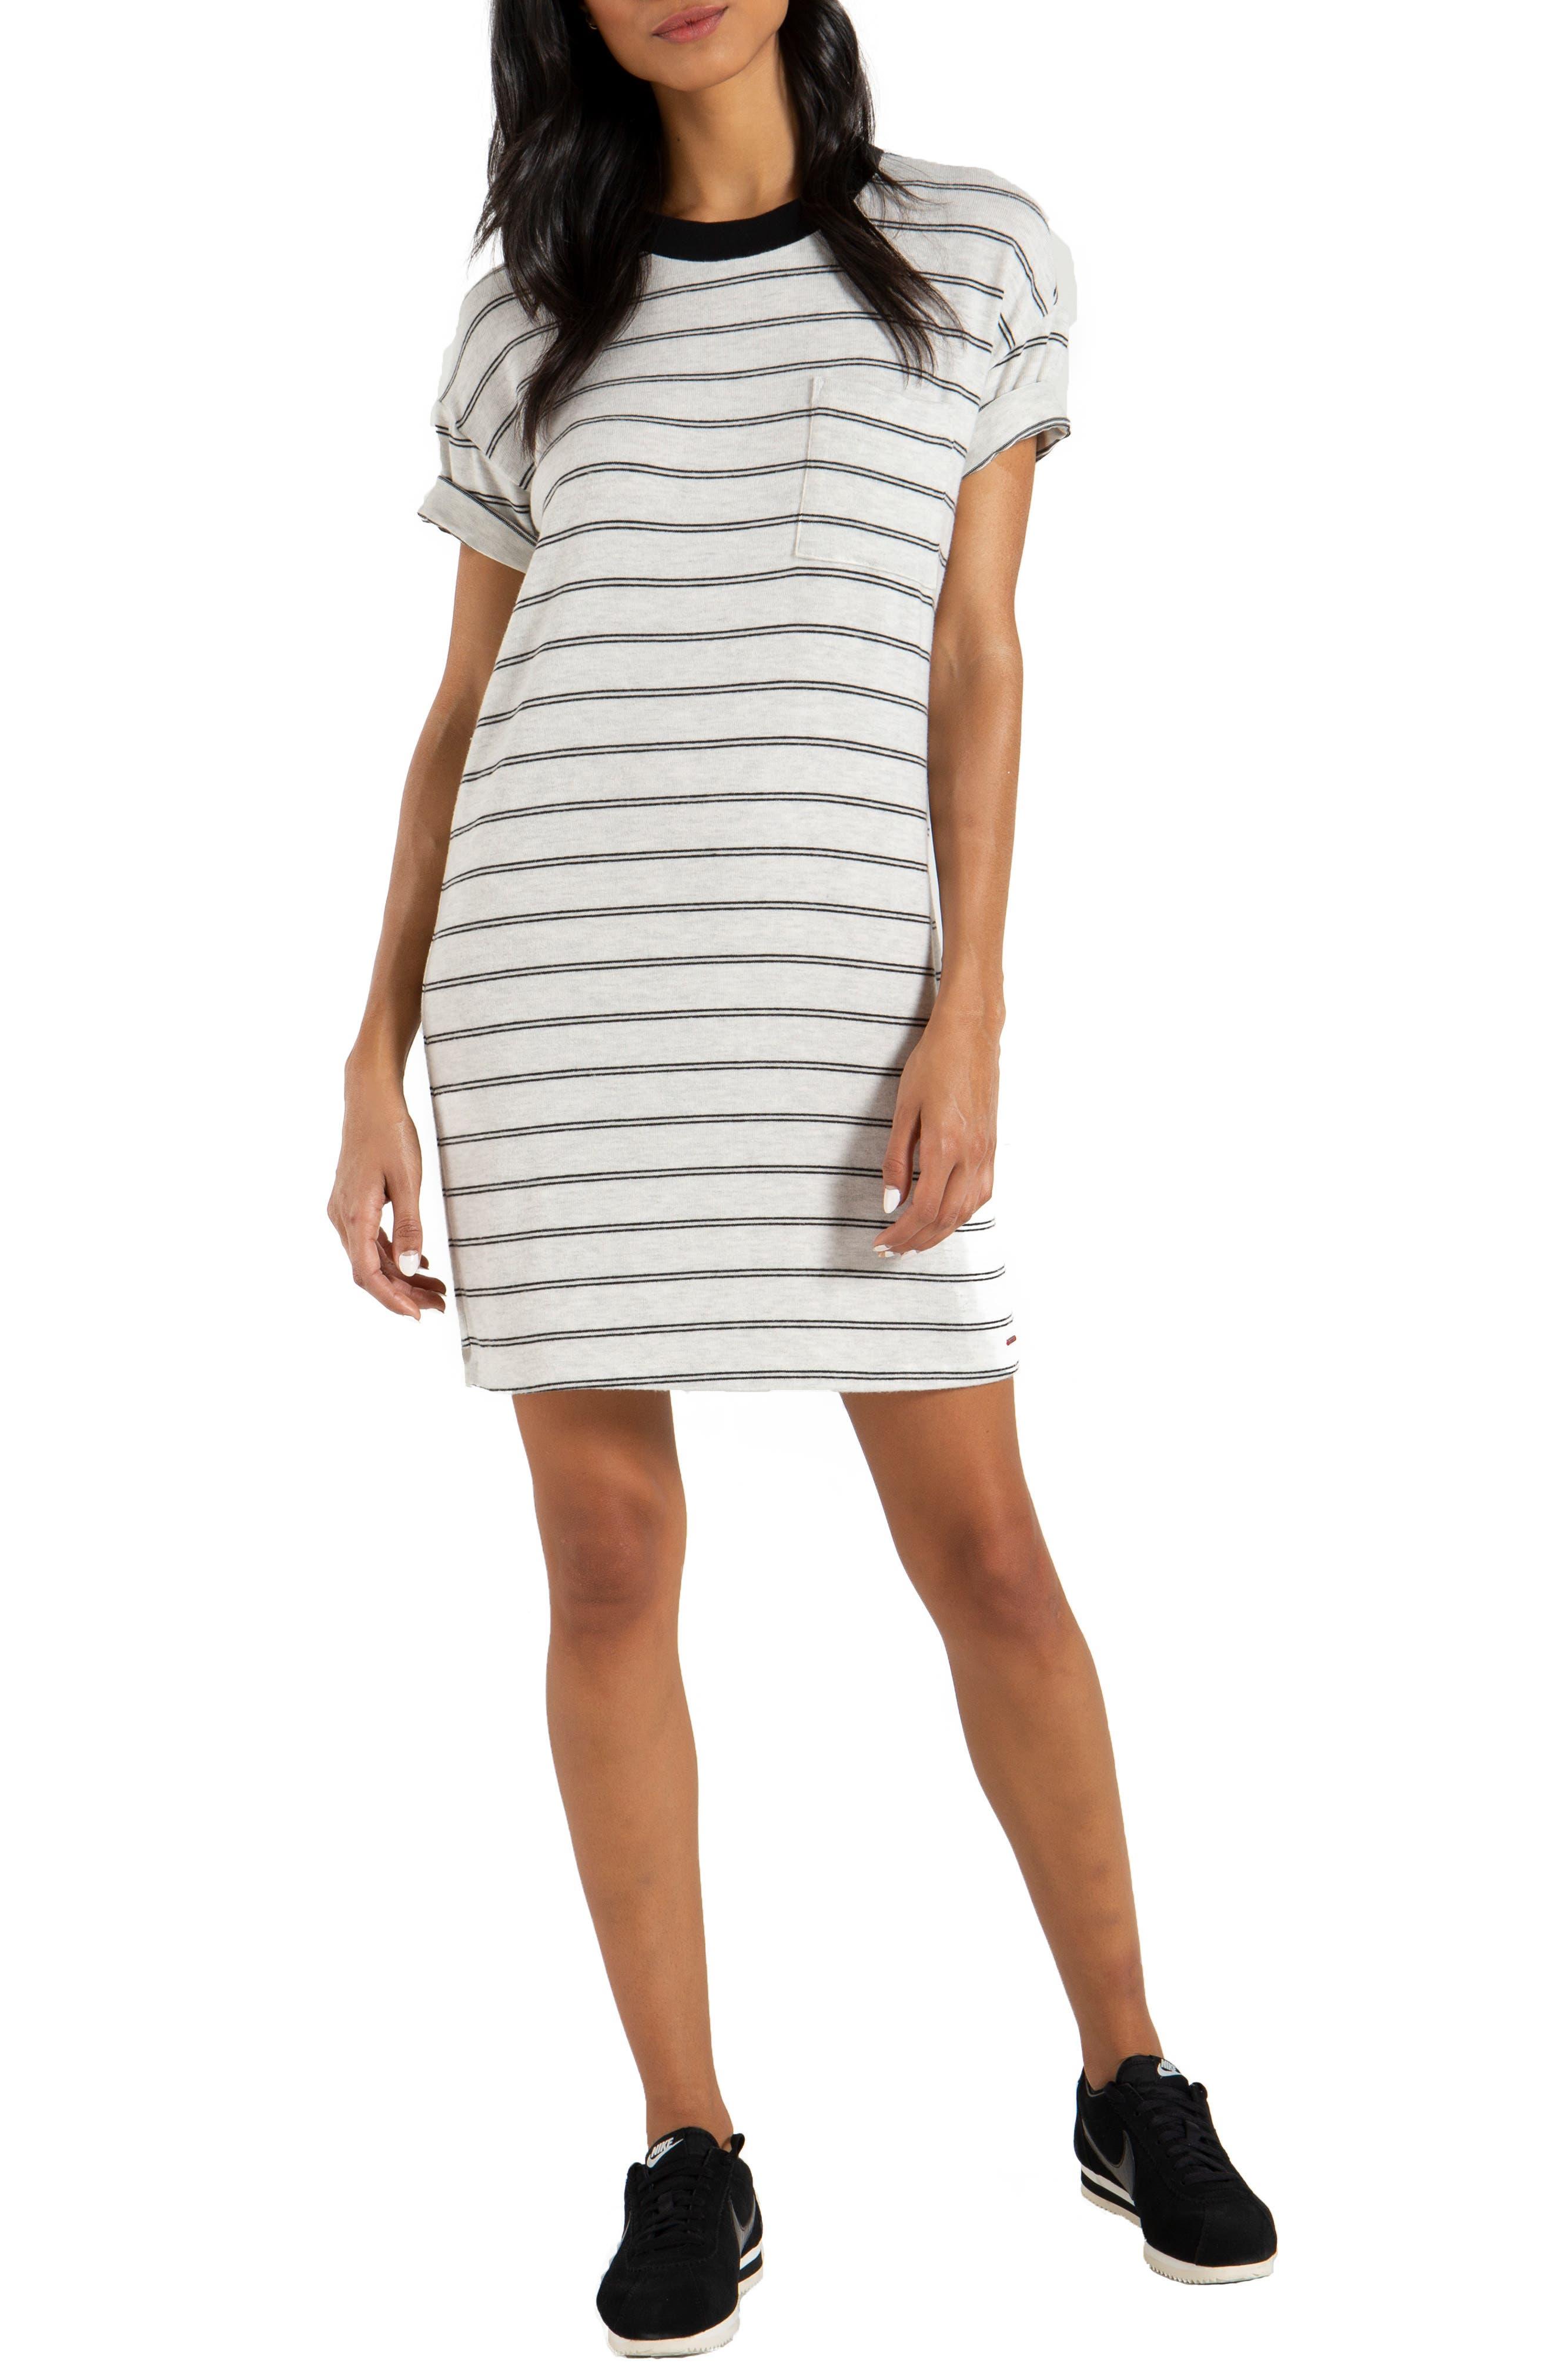 Cortez T-Shirt Dress in Black Stripe